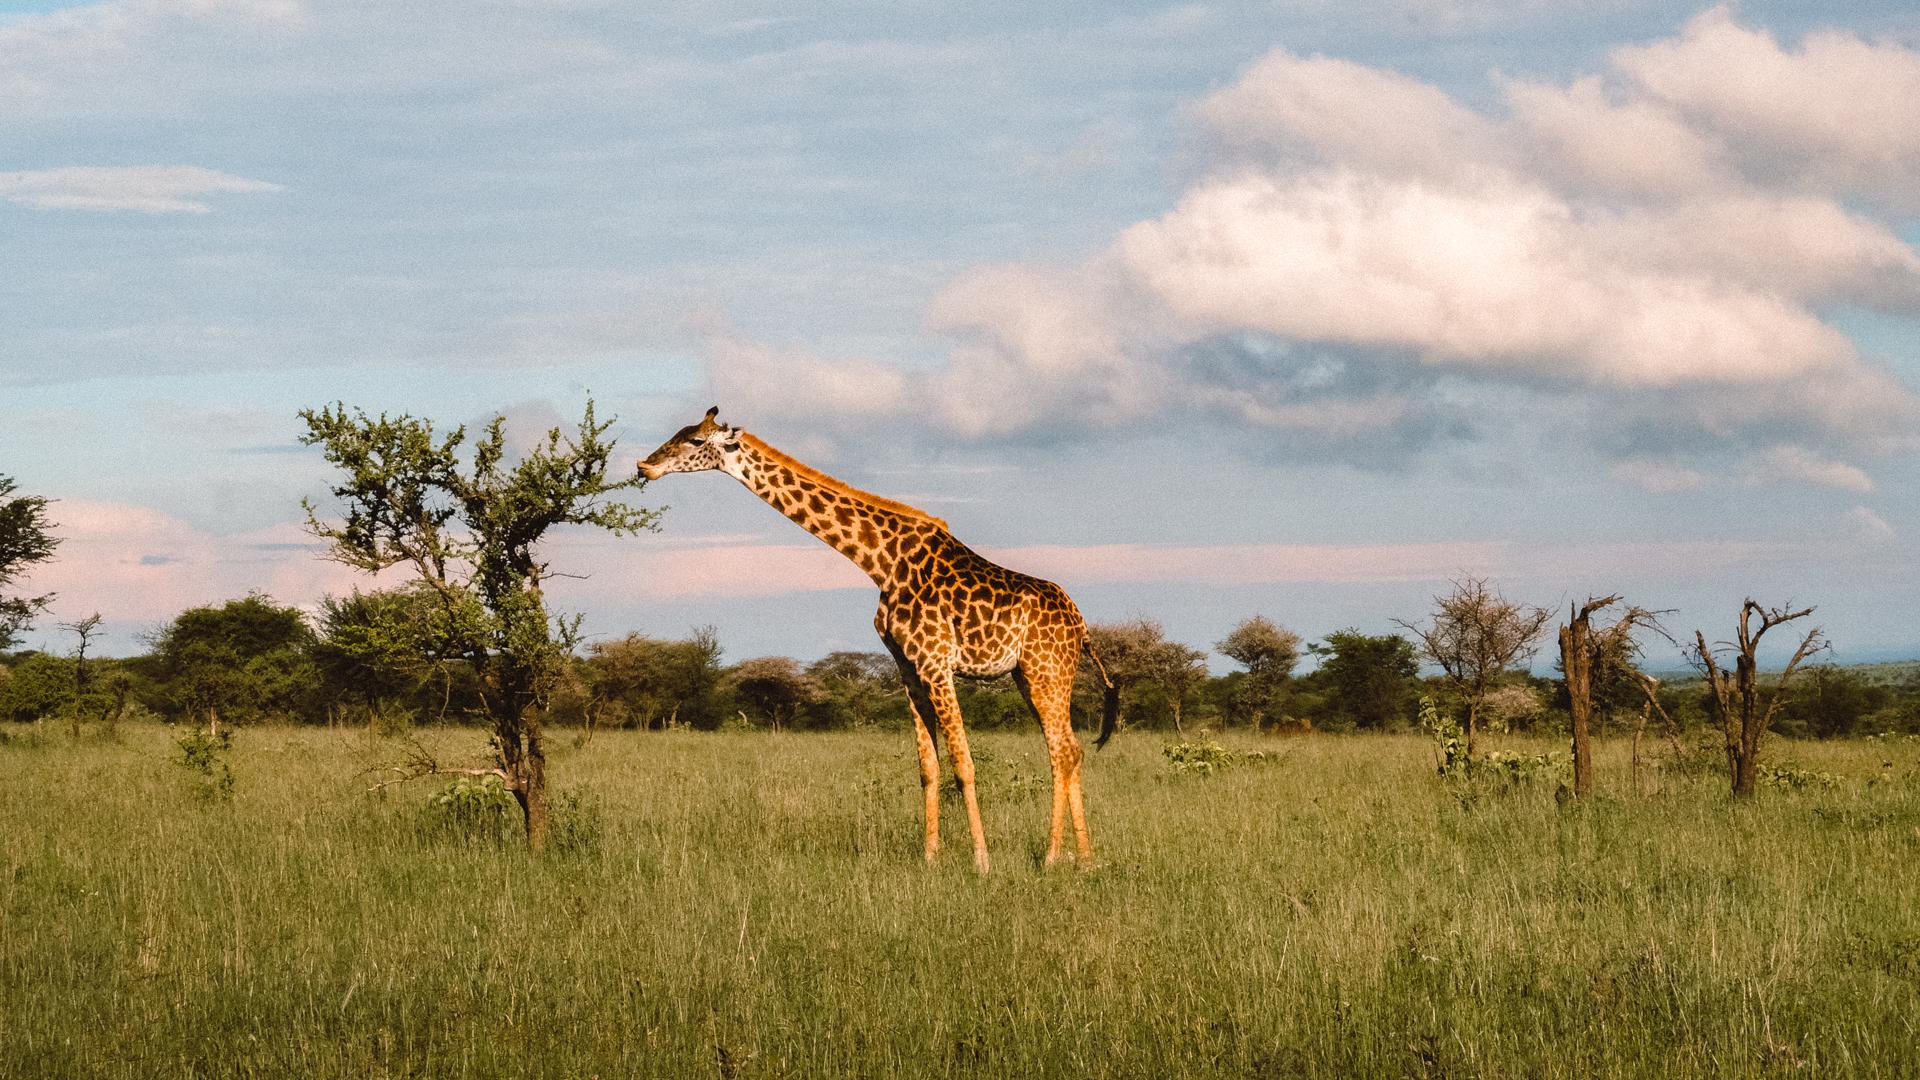 A lone giraffe eating off an acacia tree in the Serengeti National Park, Tanzania